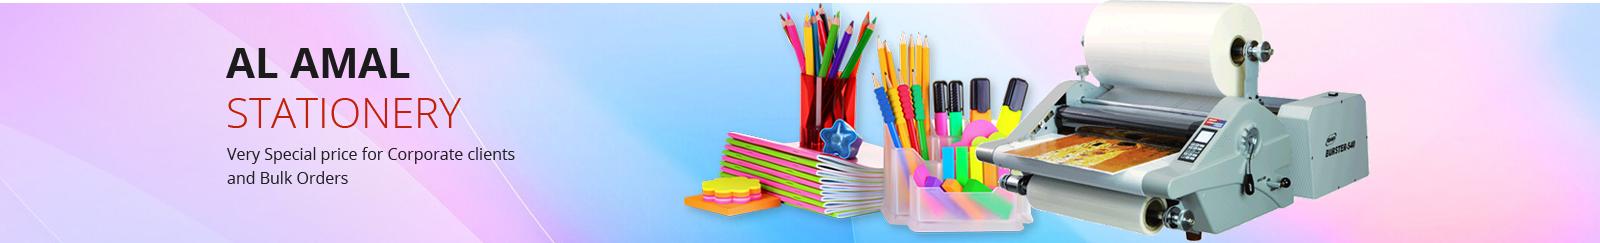 Office Supplies Online Dubai Abu Dhabi Uae Stationery Products Equipment